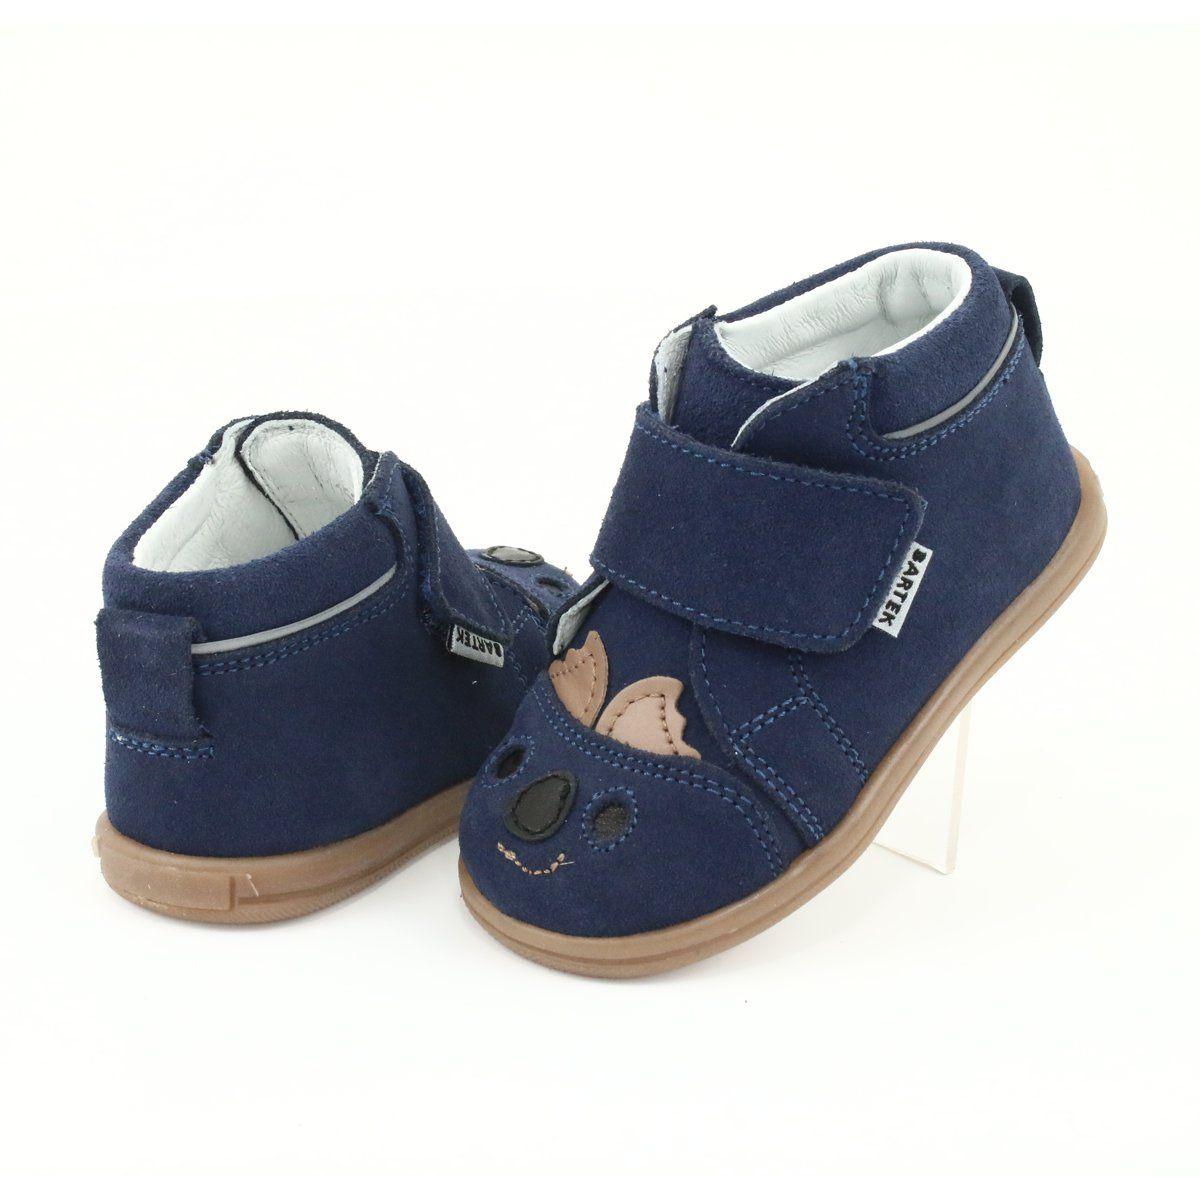 Trzewiki Na Rzepy Panda Bartek 71150 Granatowe Baby Shoes Shoes Fashion